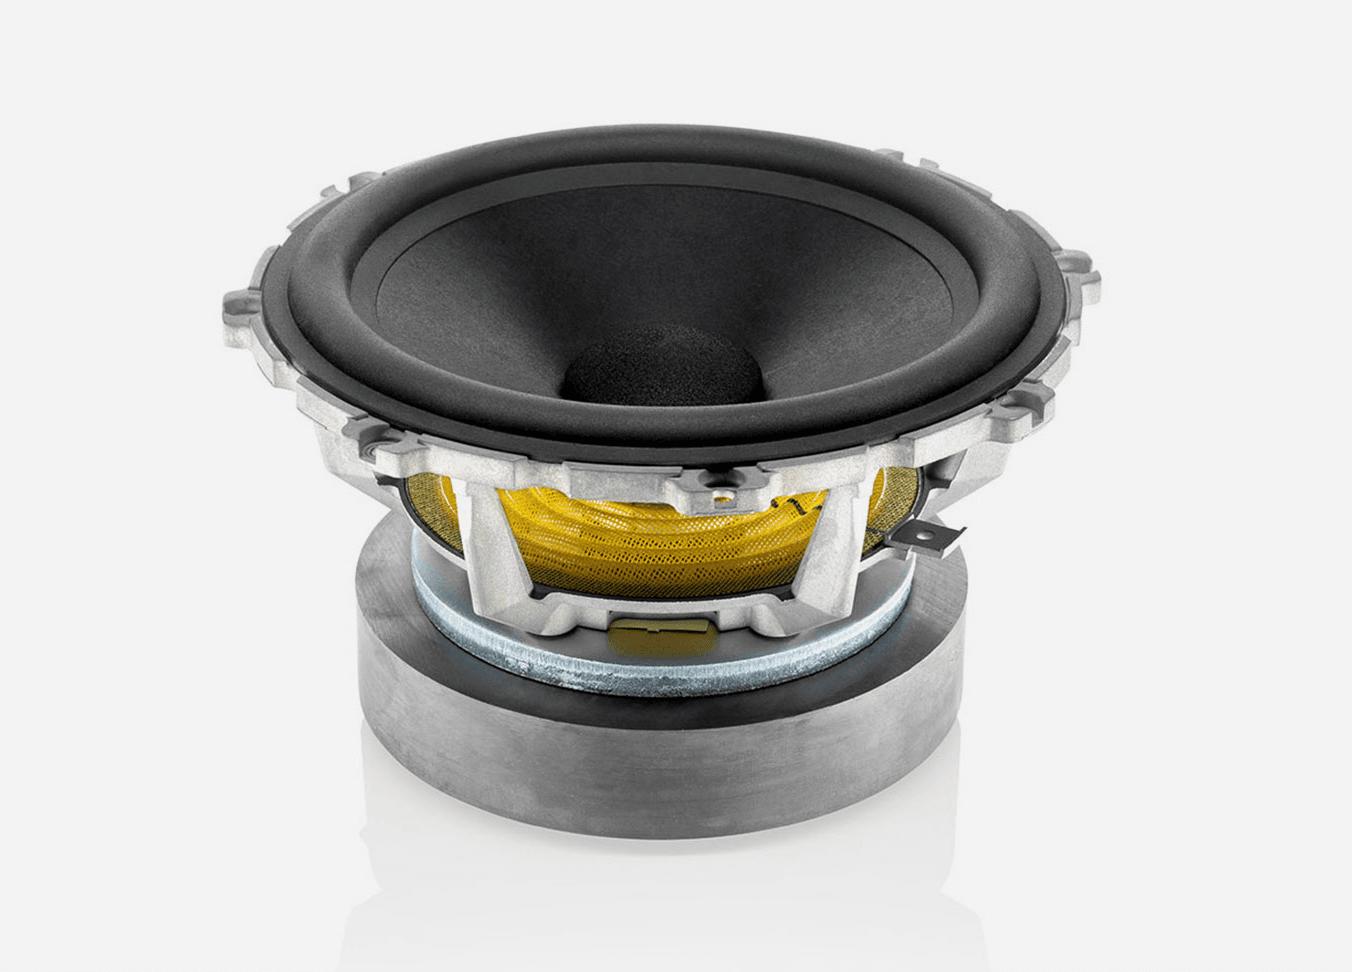 Aerofoil compressor - B&W(Bowers & Wilkins)トールボーイスピーカー704S2のレビュー【30万円台】